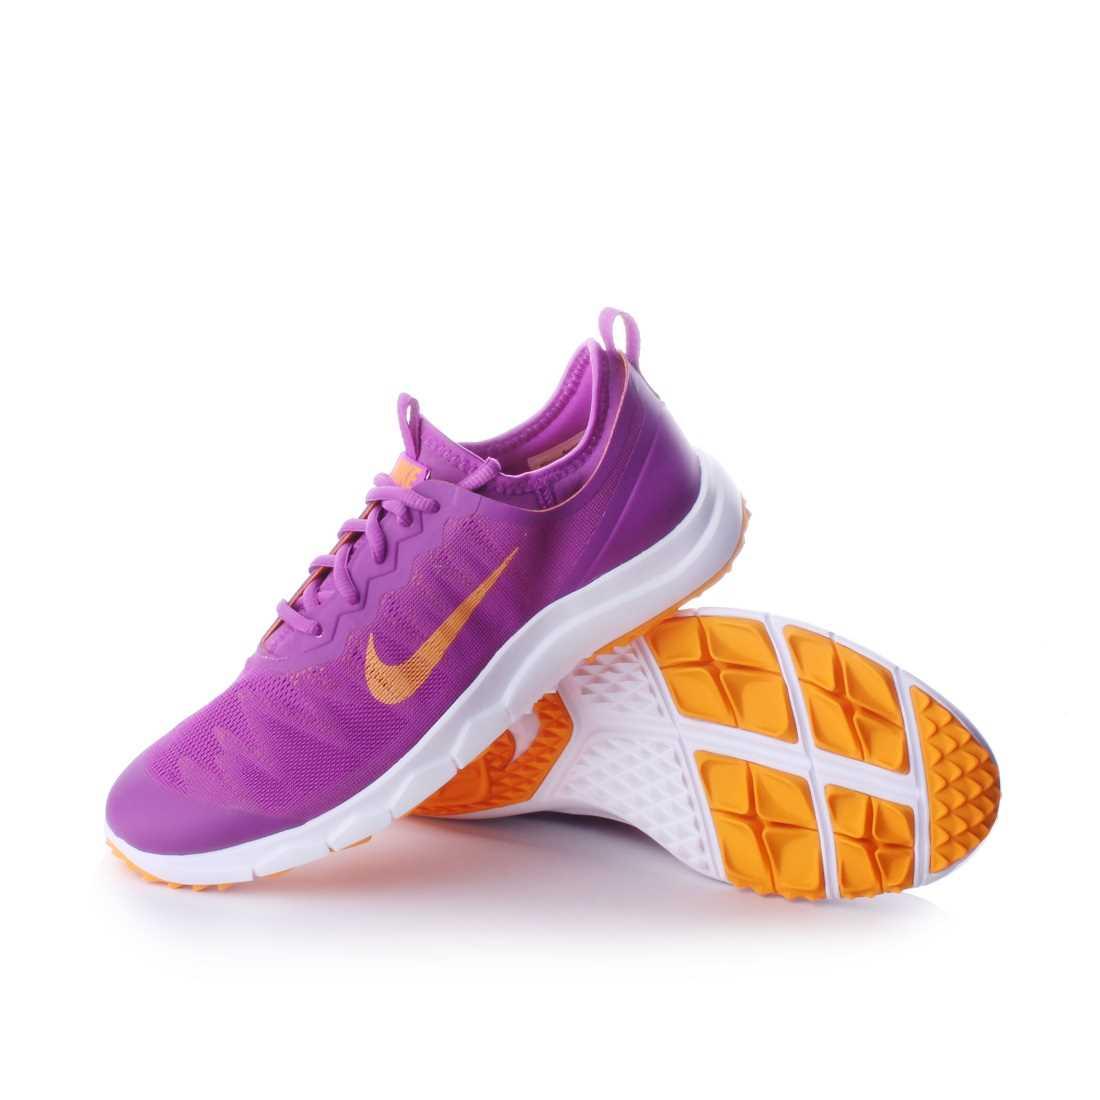 e147c0e51f766 Nike FI Bermuda Women s Spikeless Golf Shoe in Purple Orange White